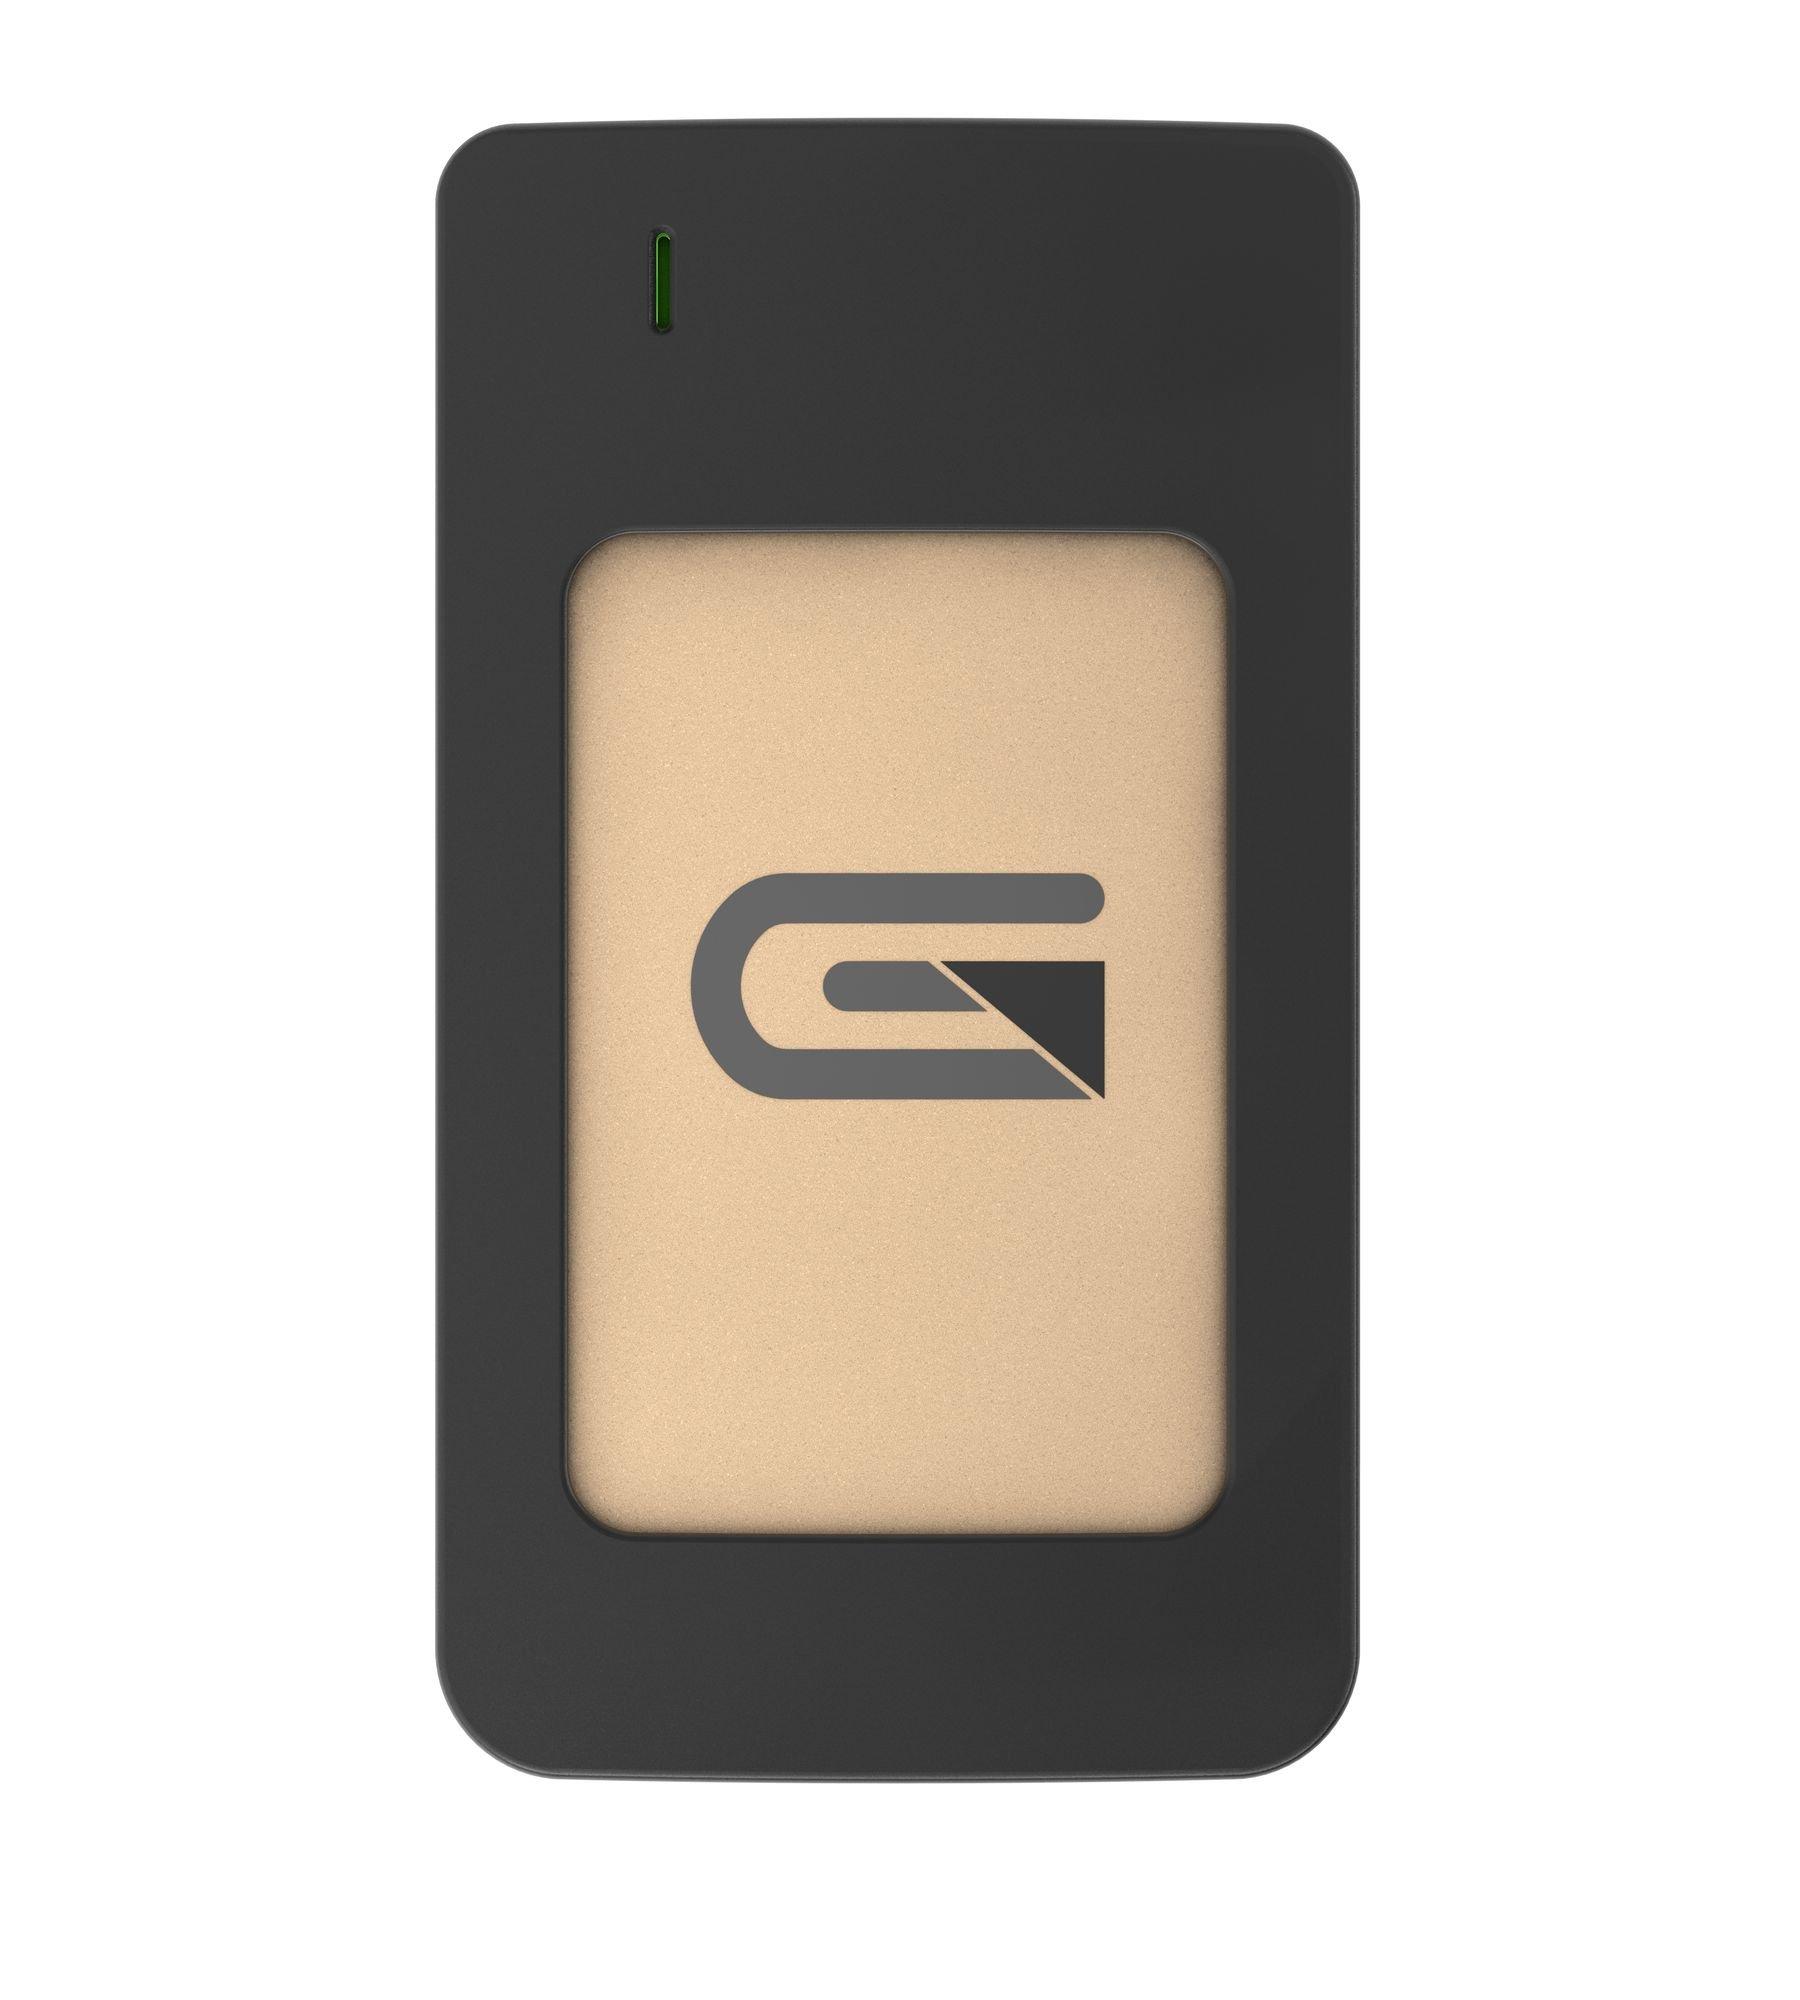 Glyph Atom RAID SSD 4TB Gold (External USB-C, USB 3.0, Thunderbolt 3) AR4000GLD